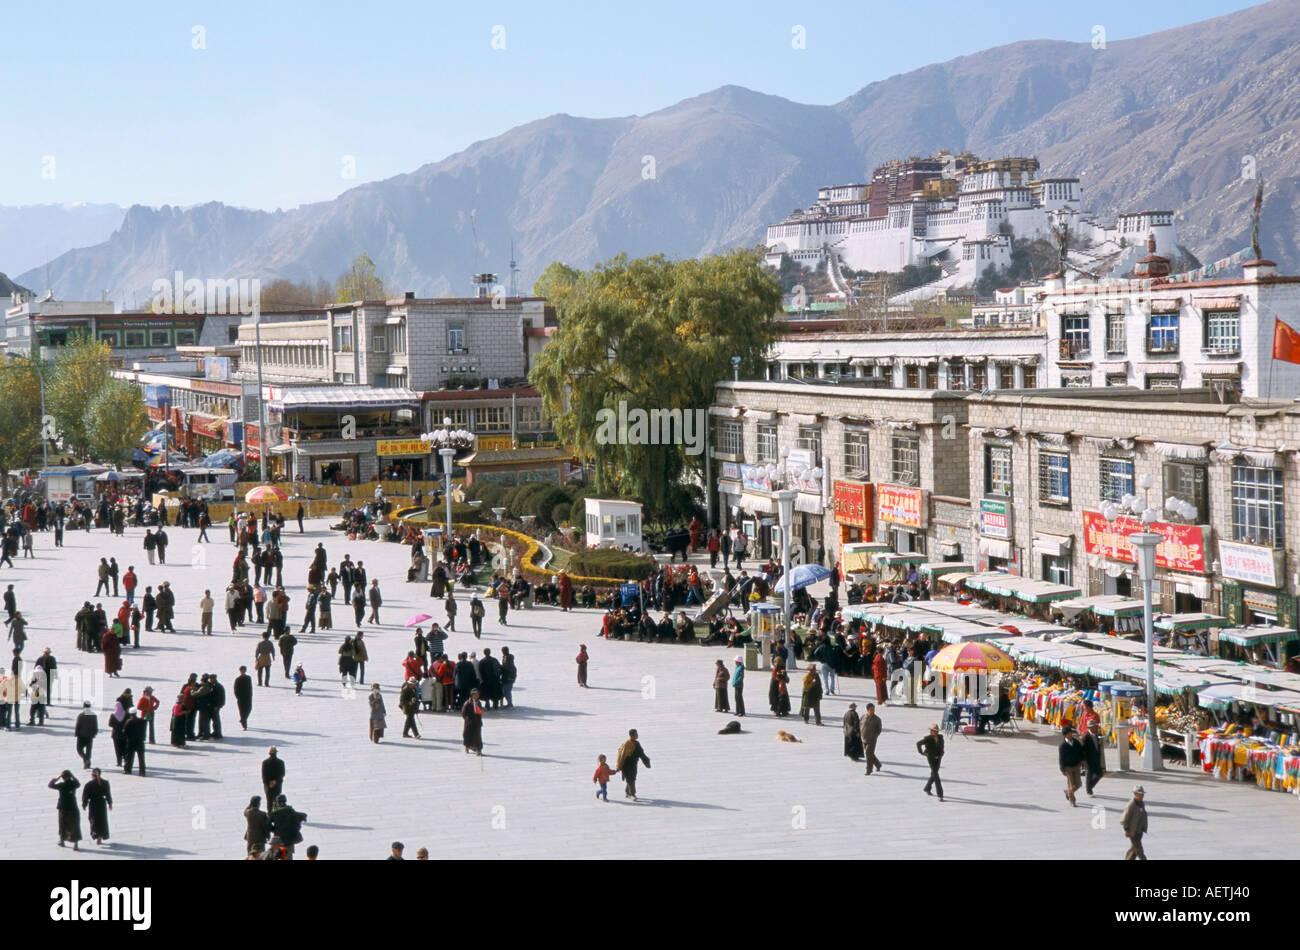 Main square in front of Jokhang Potala palace beyond Lhasa Tibet China Asia - Stock Image